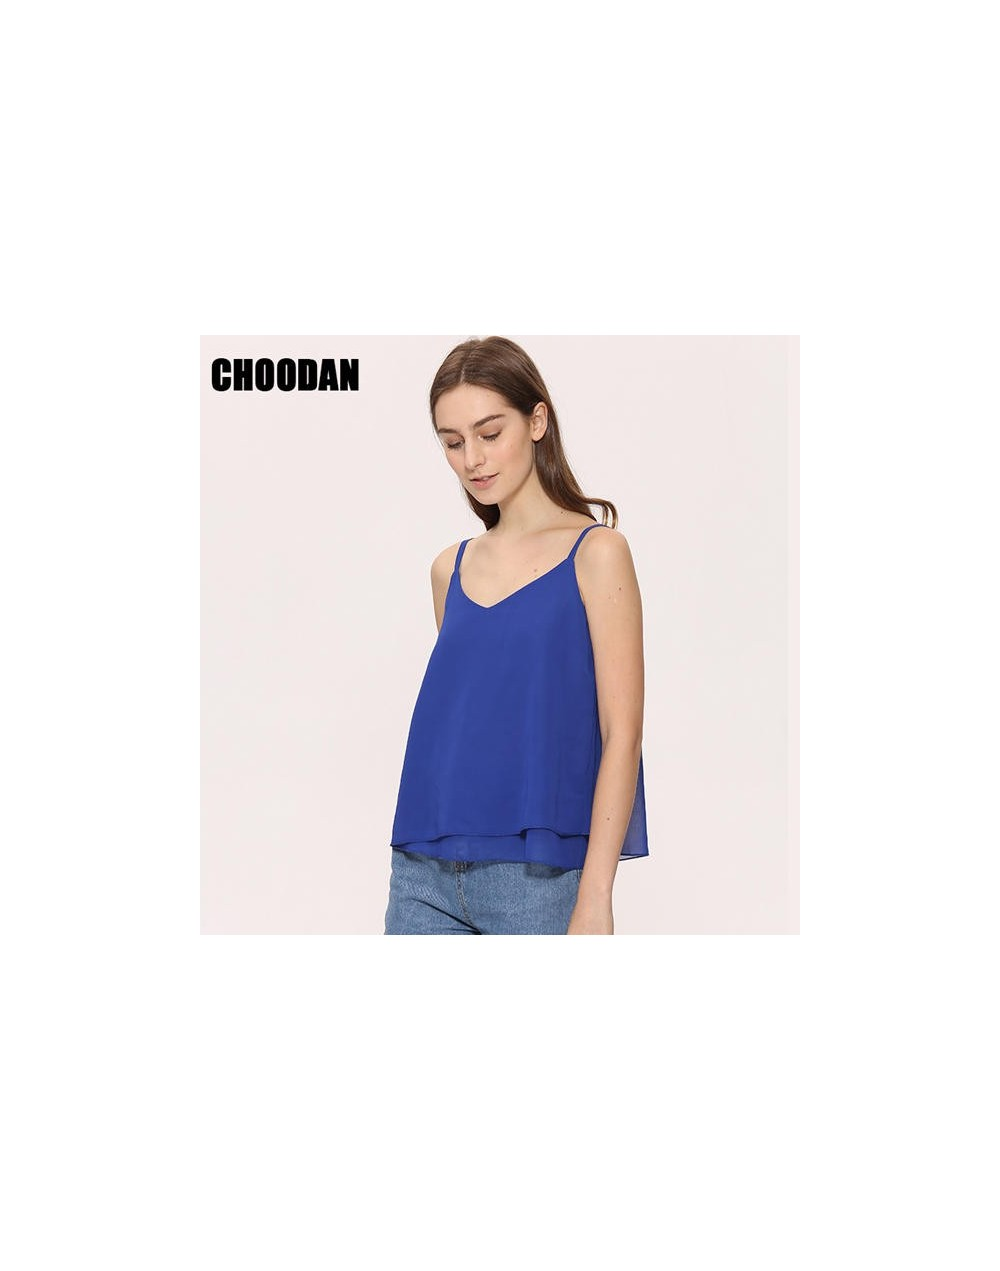 Camis Tank Top Women Chiffon Blouses Shirts 2018 Brand New Summer Sleeveless Shirt Loose Female Top Vest Lady Casual Women S...